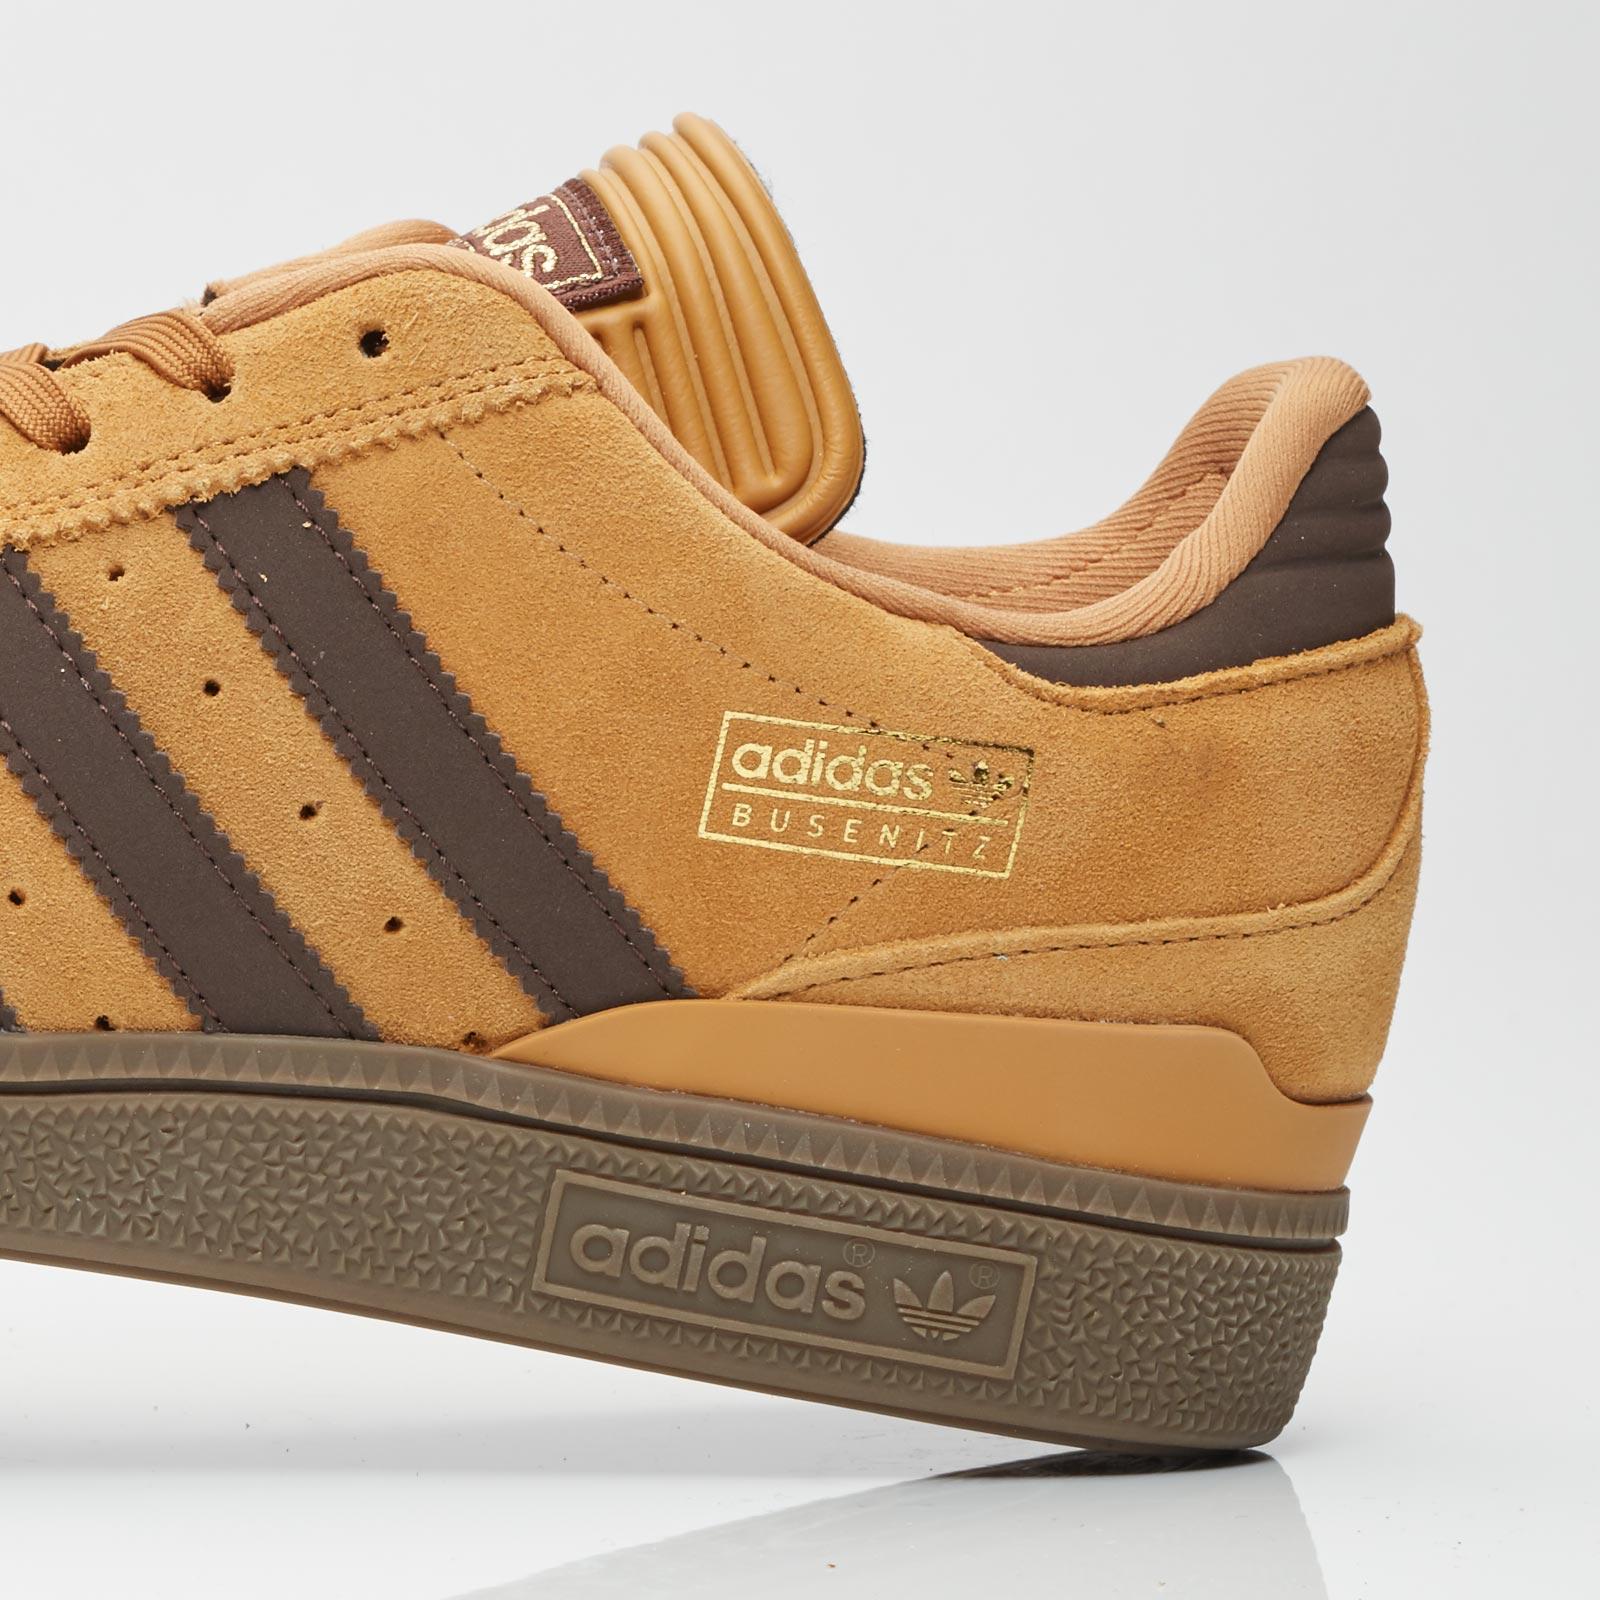 designer fashion 18c60 7934c ... reduced sneakersnstuff adidas sneakers streetwear på amp busenitz  by3966 qfz4g 4aac9 89964